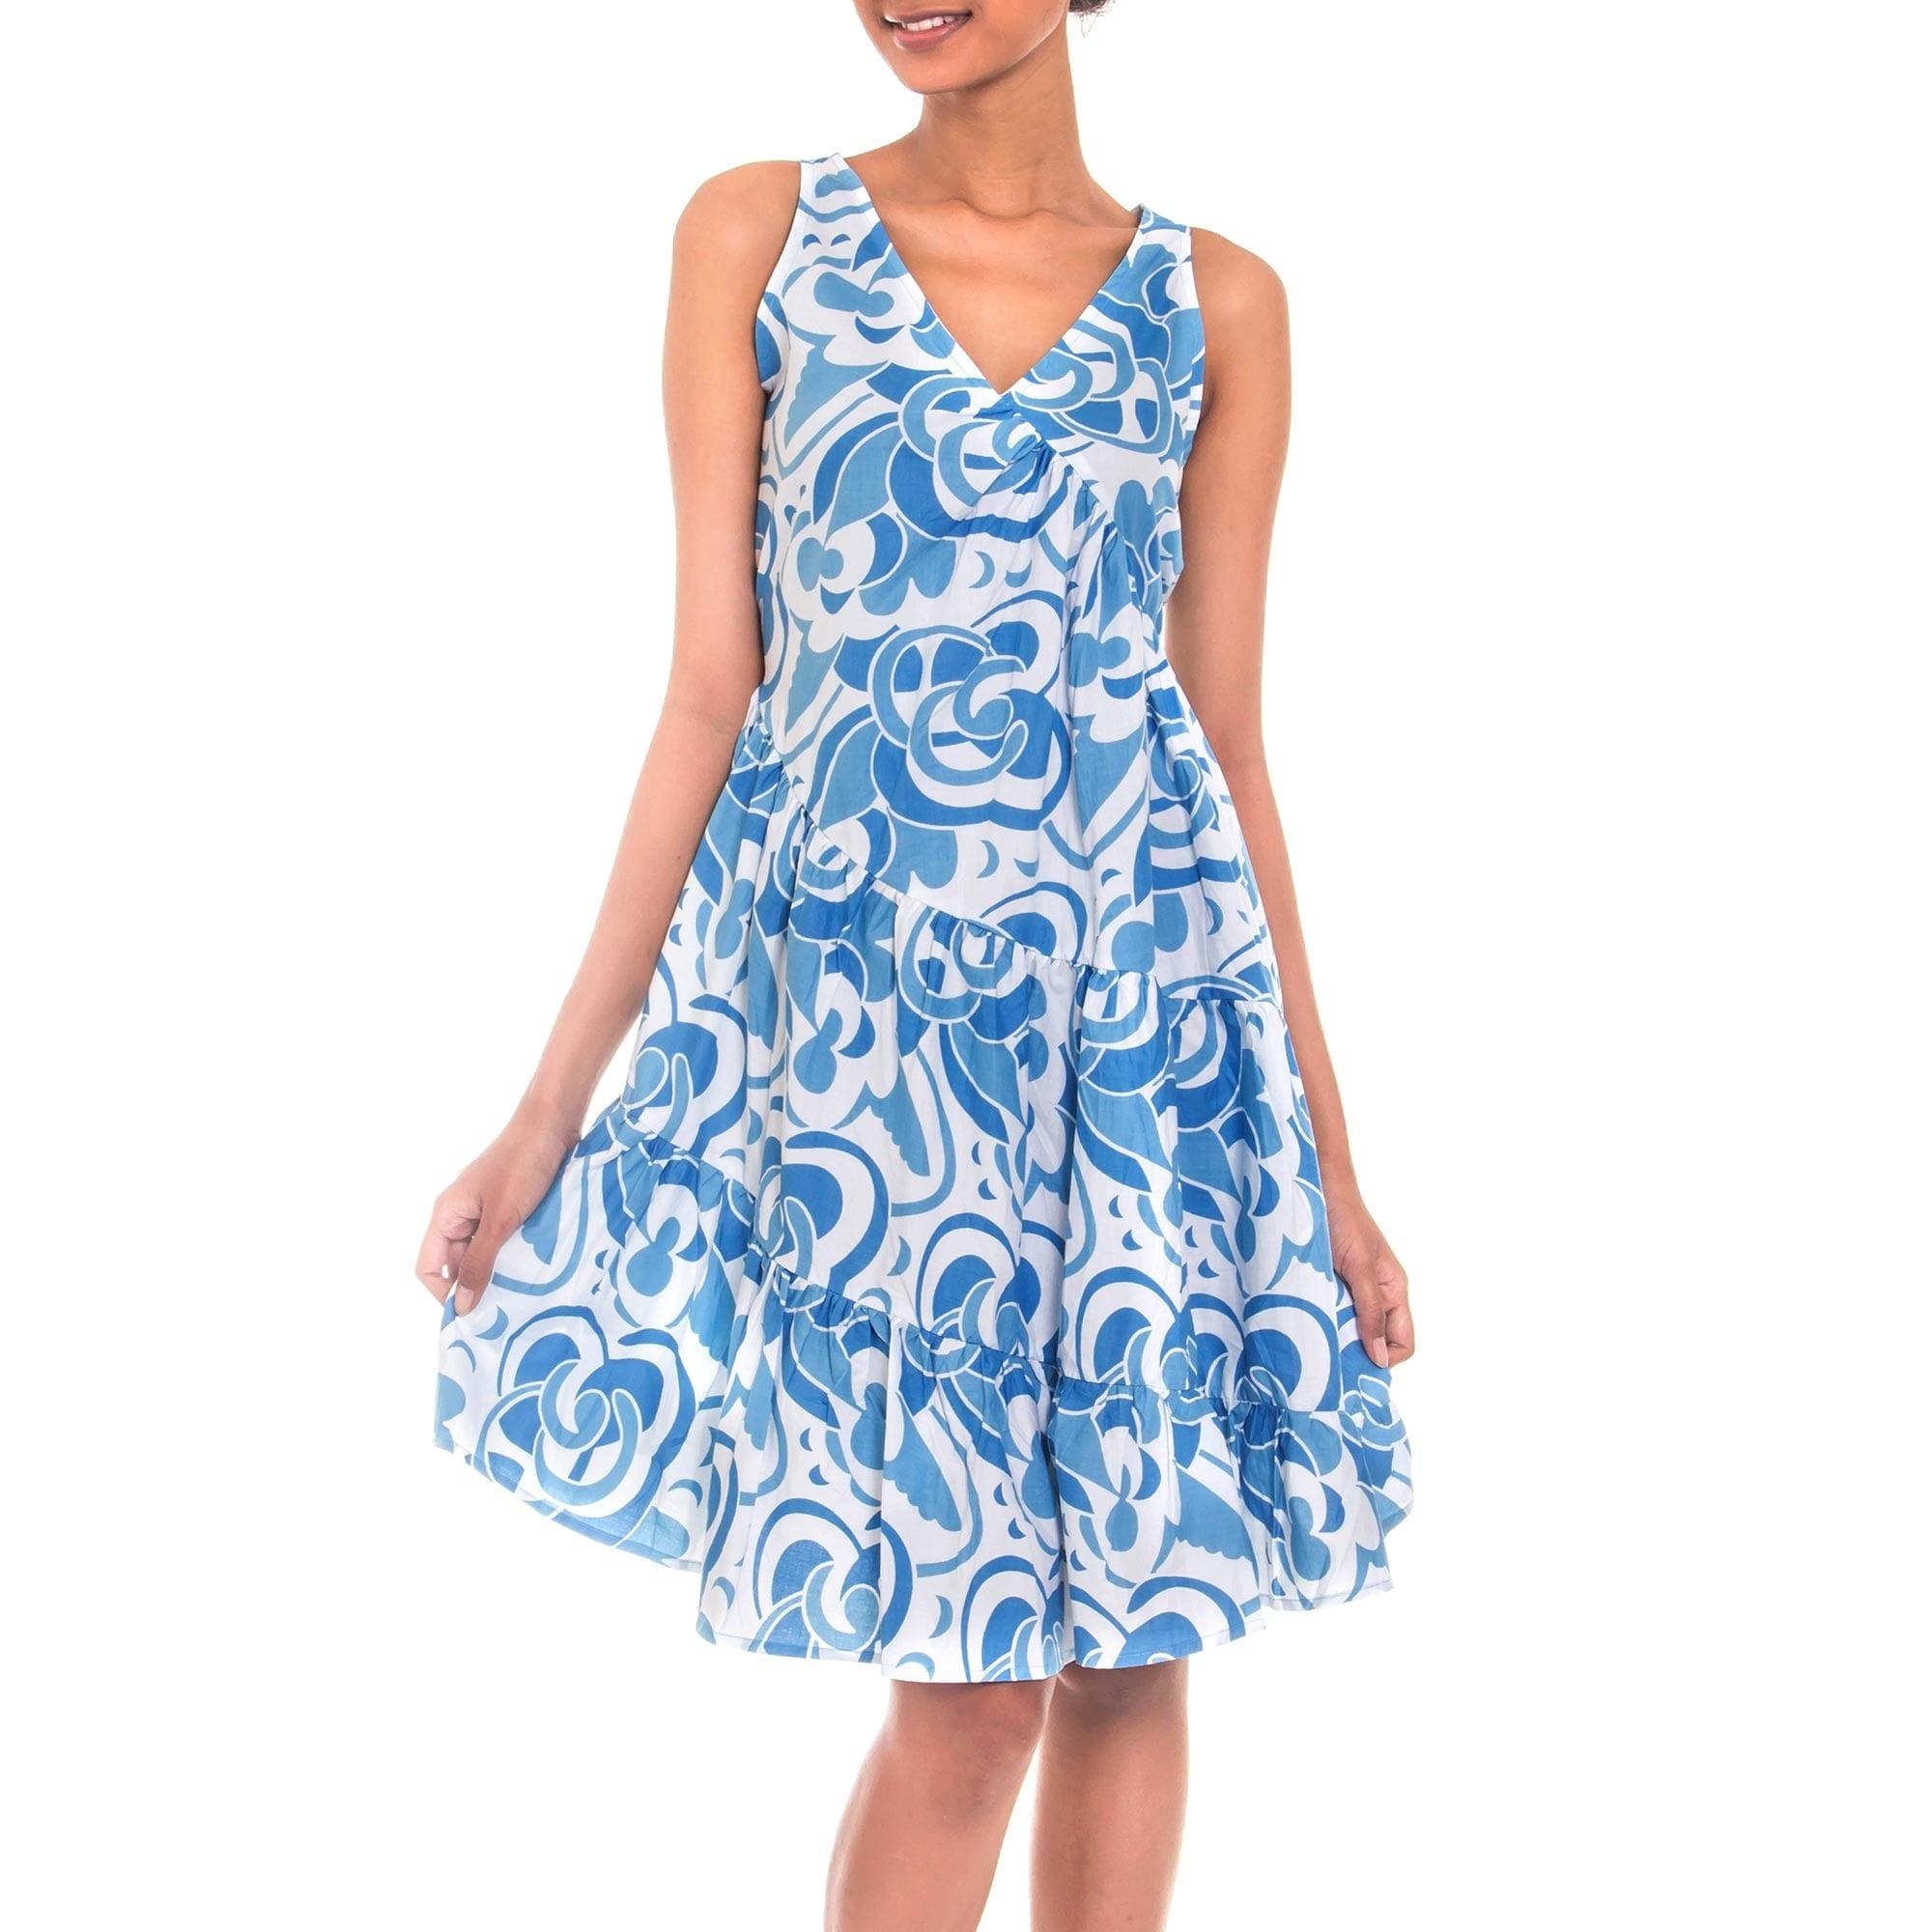 a4746aa6087f Balinese Sea Handmade Artisan Designer Cotton Blue White Batik Women's  Clothing Fashion Garden Party Swing Dress (Indonesia)